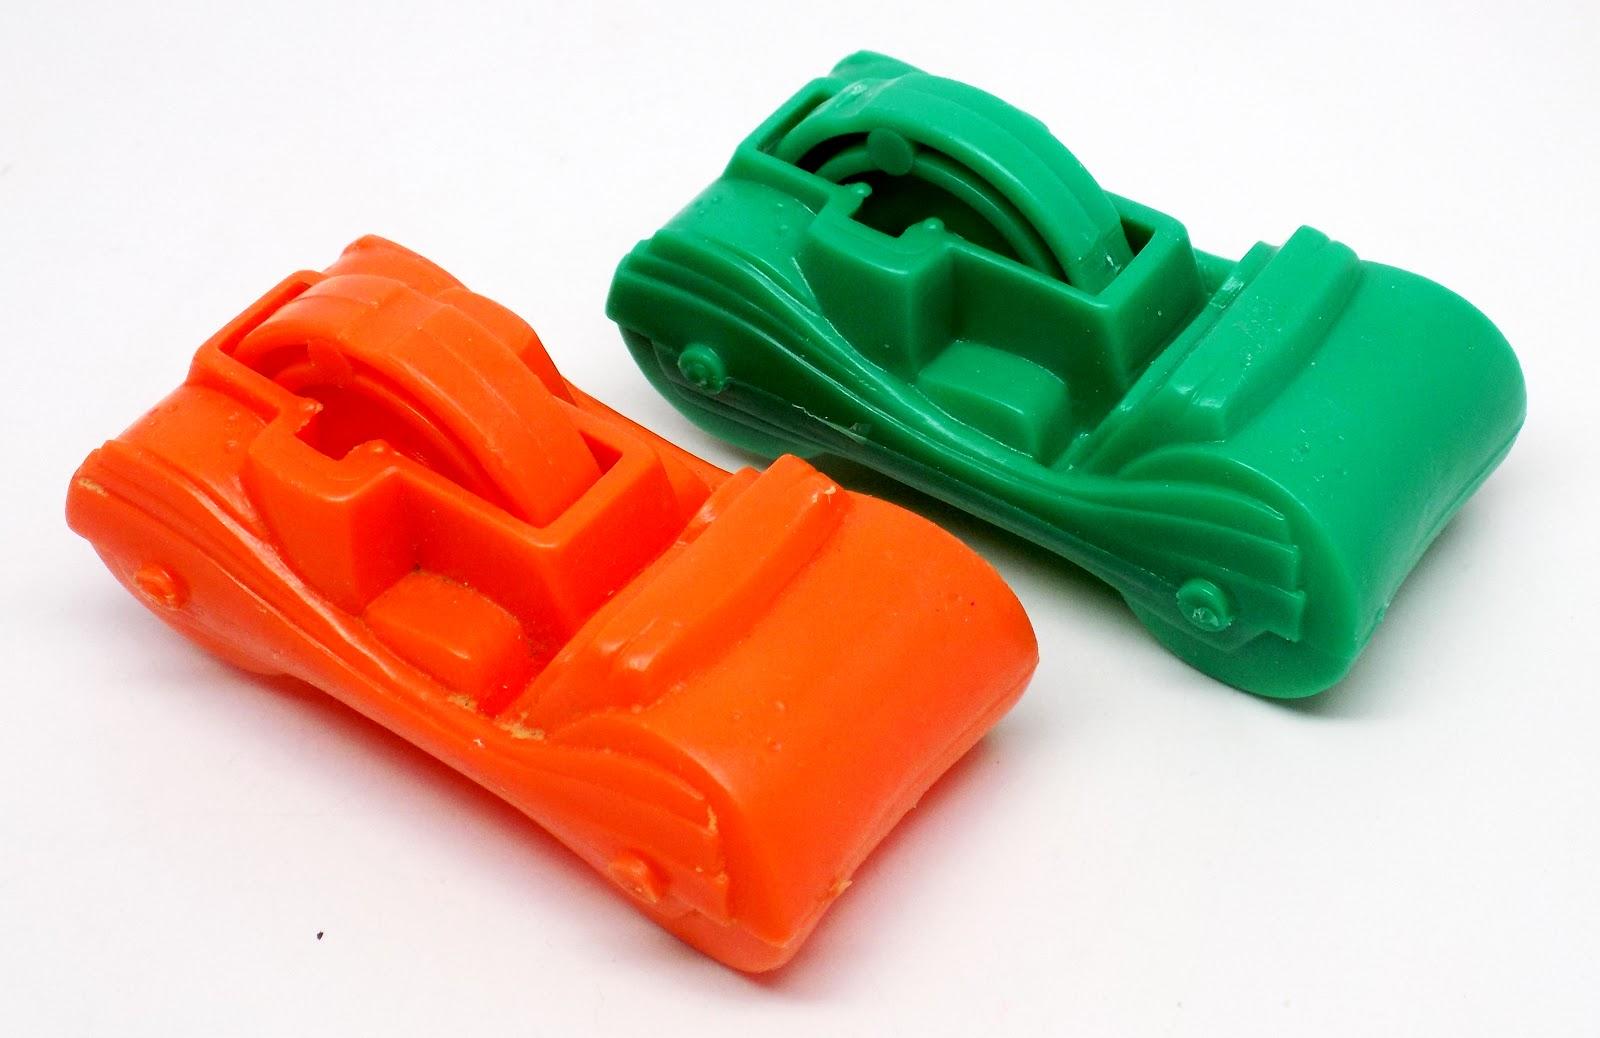 Toys and Stuff: Flintstones Fruity Pebbles Cereal Fred's Zip